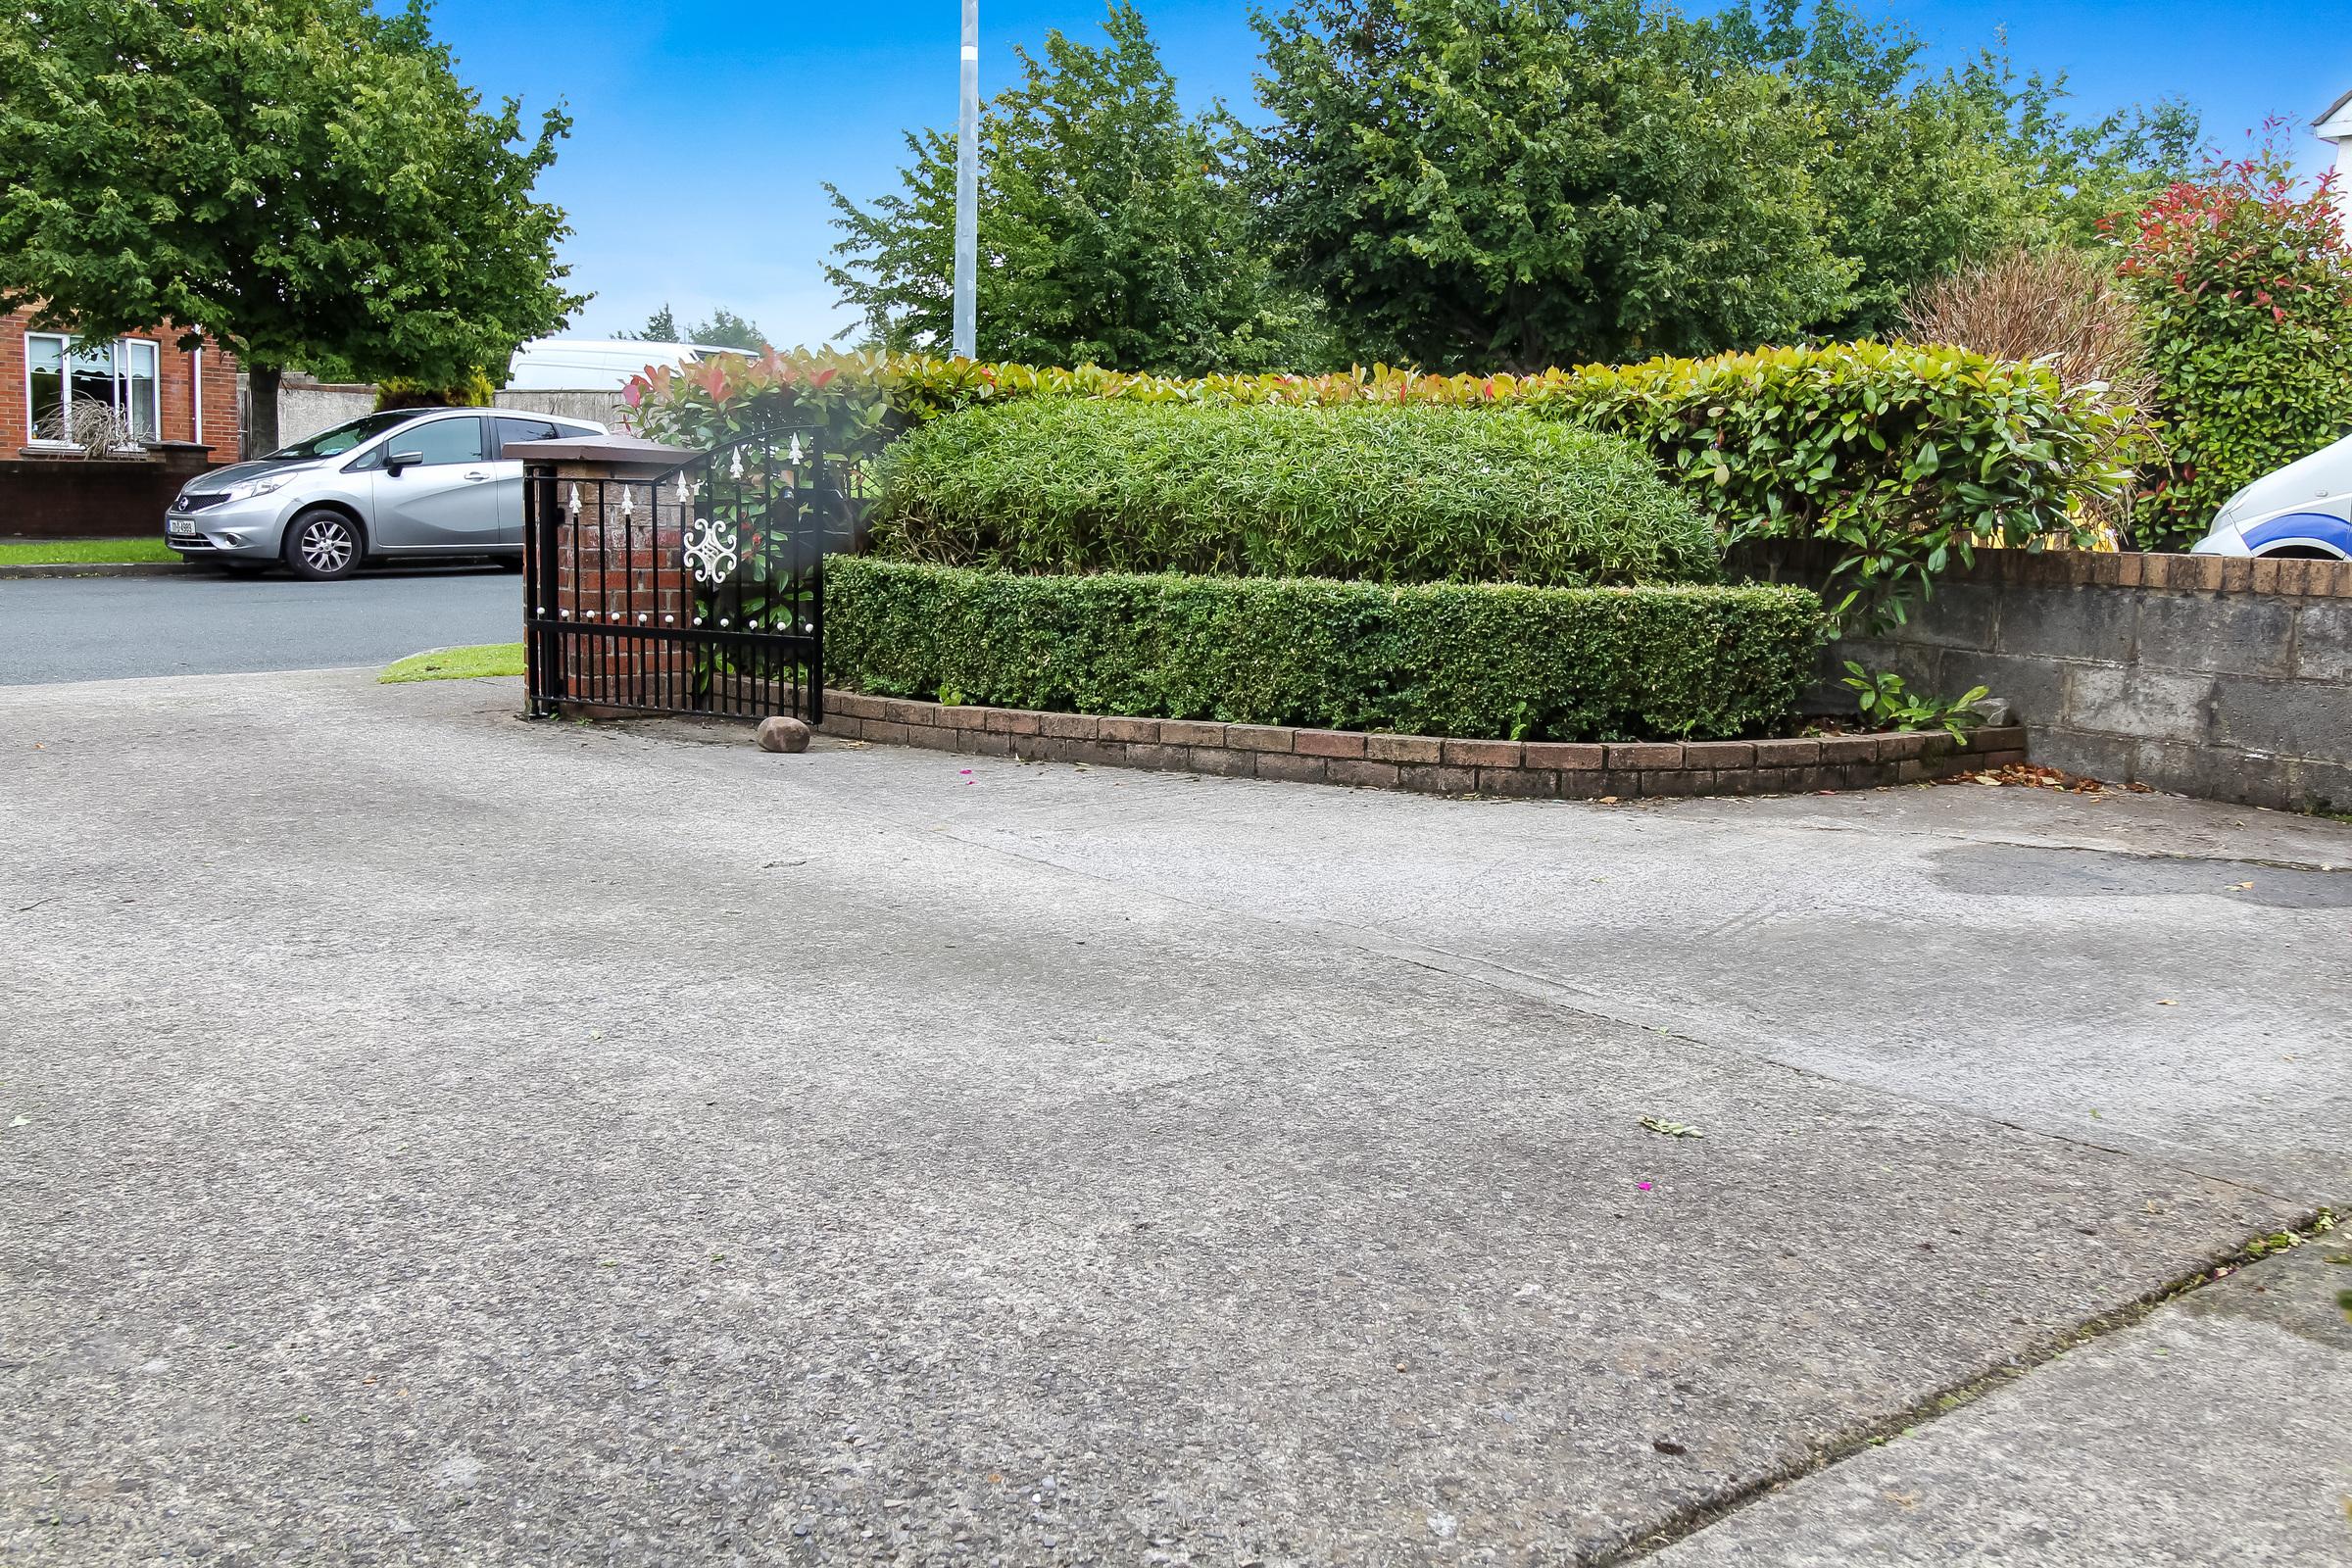 65 Hazelgrove, Blessington Road, Tallaght, Dublin 24